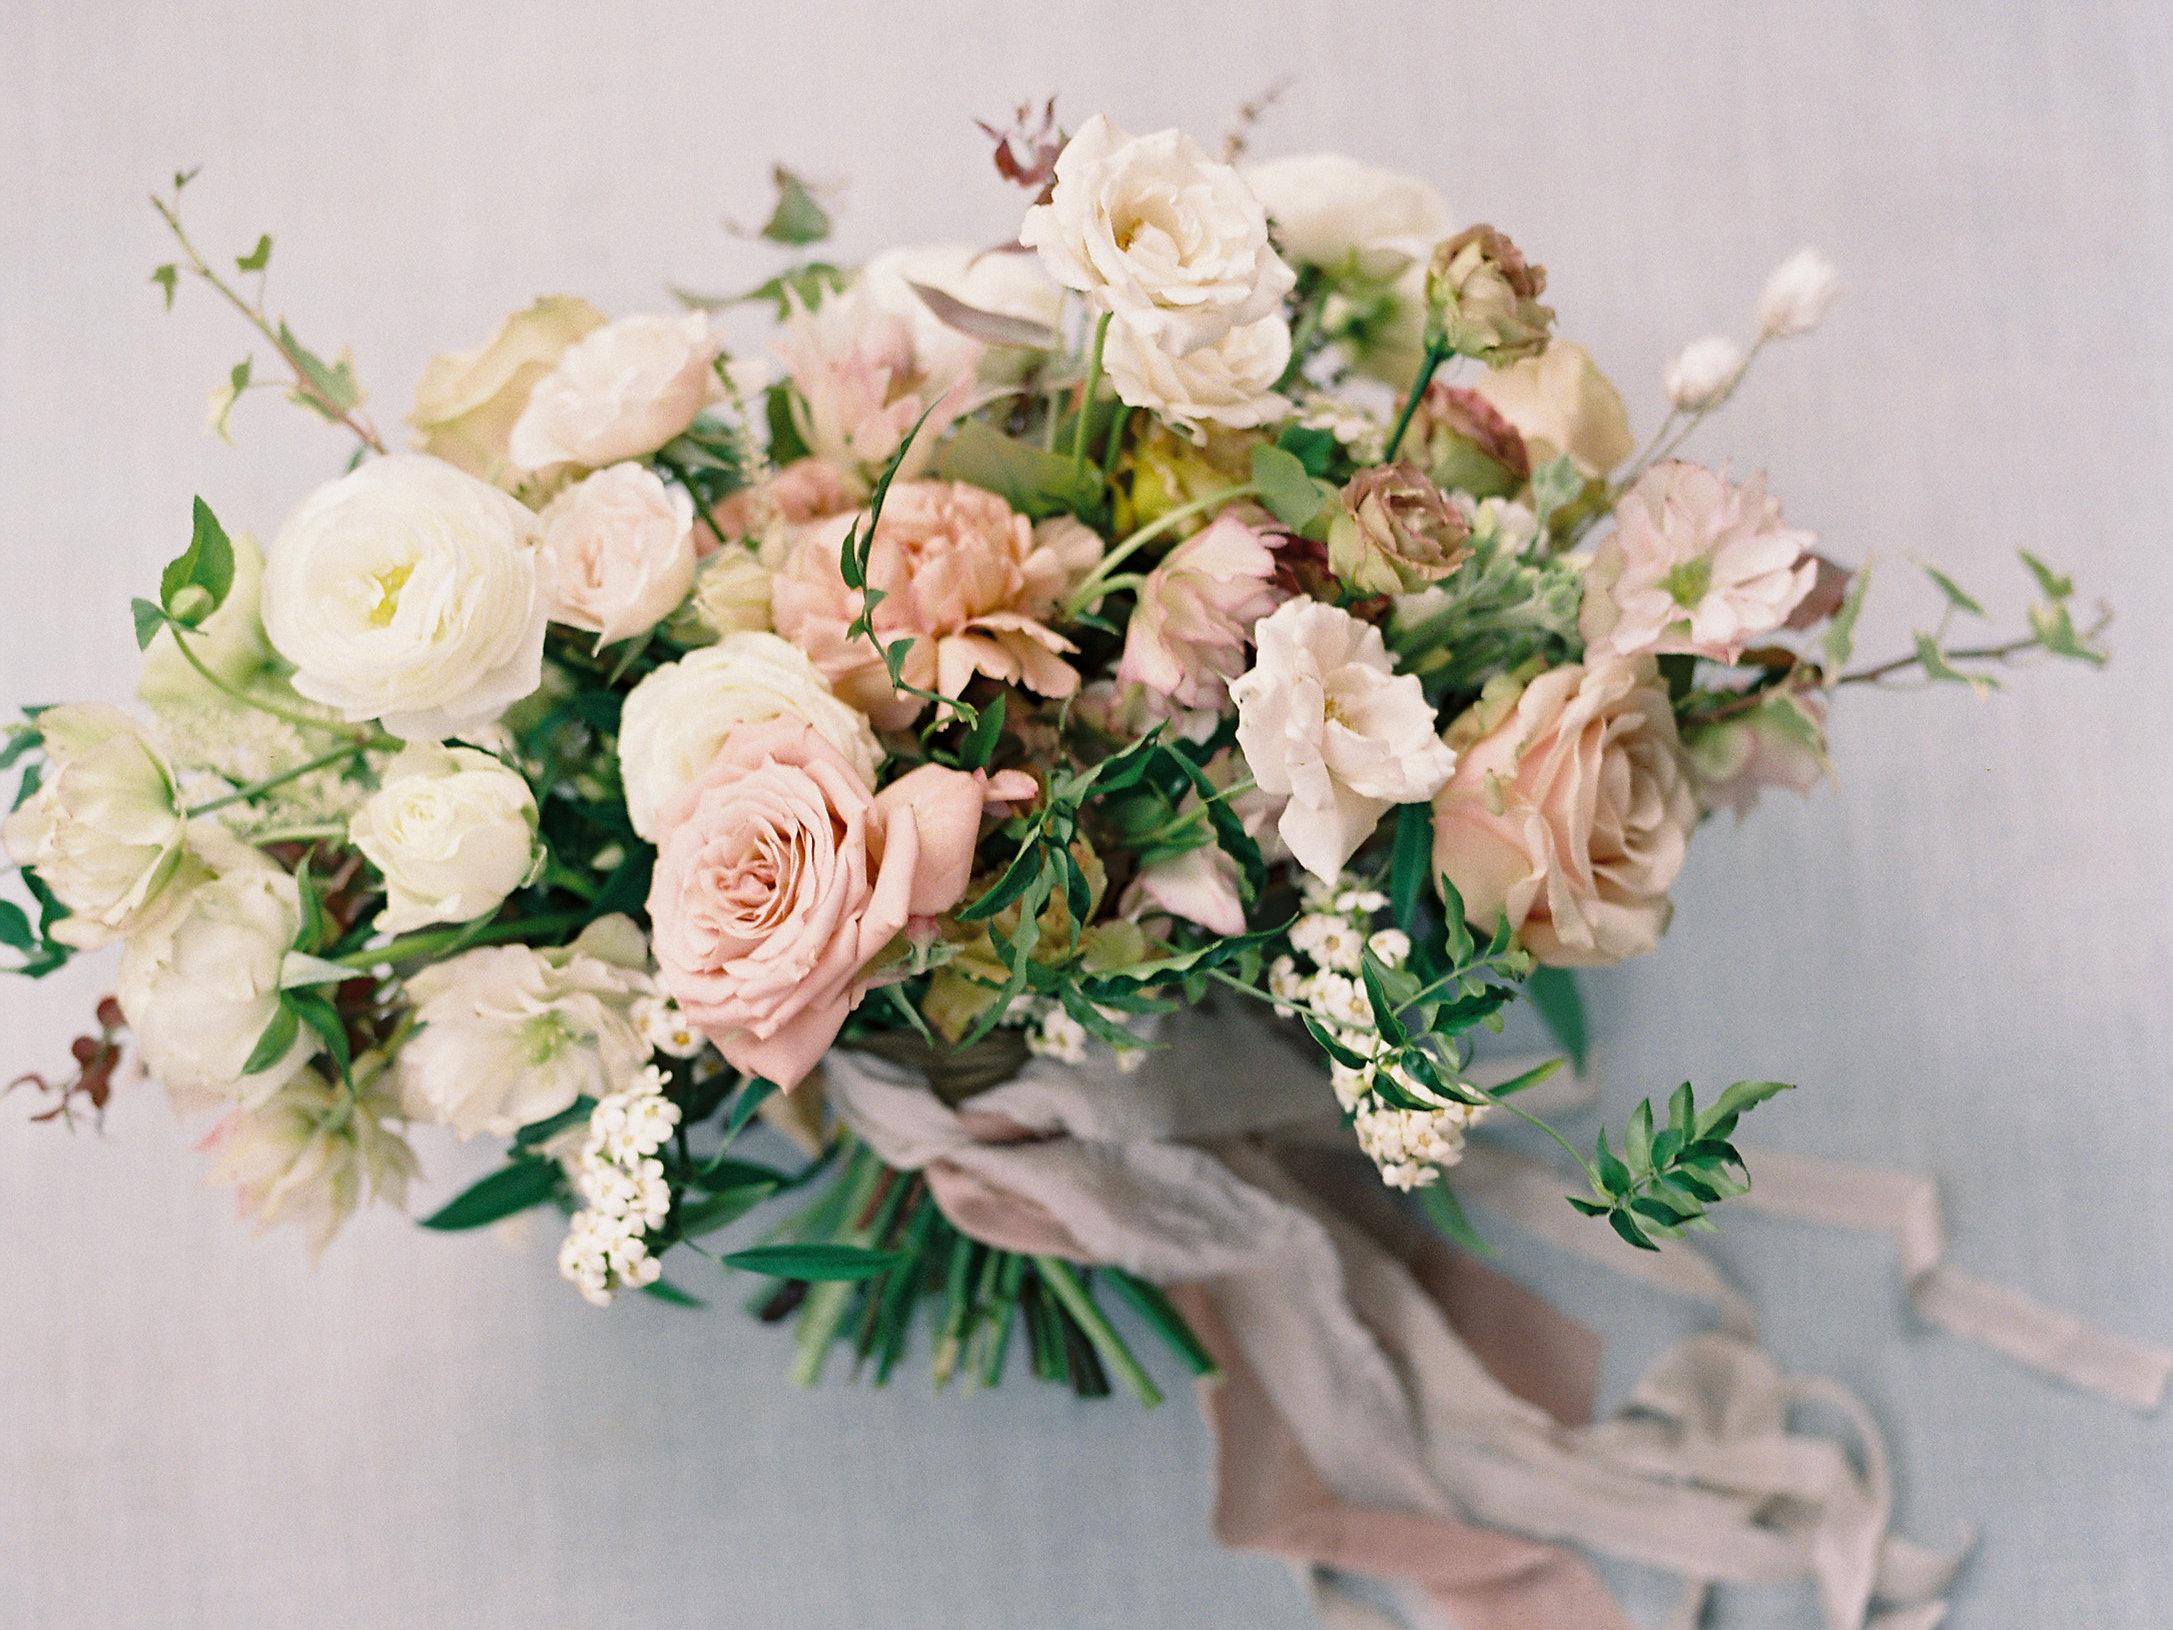 jessica-zimmerman-events-heather-payne-dan-and-shay-arkansas-wedding.jpg